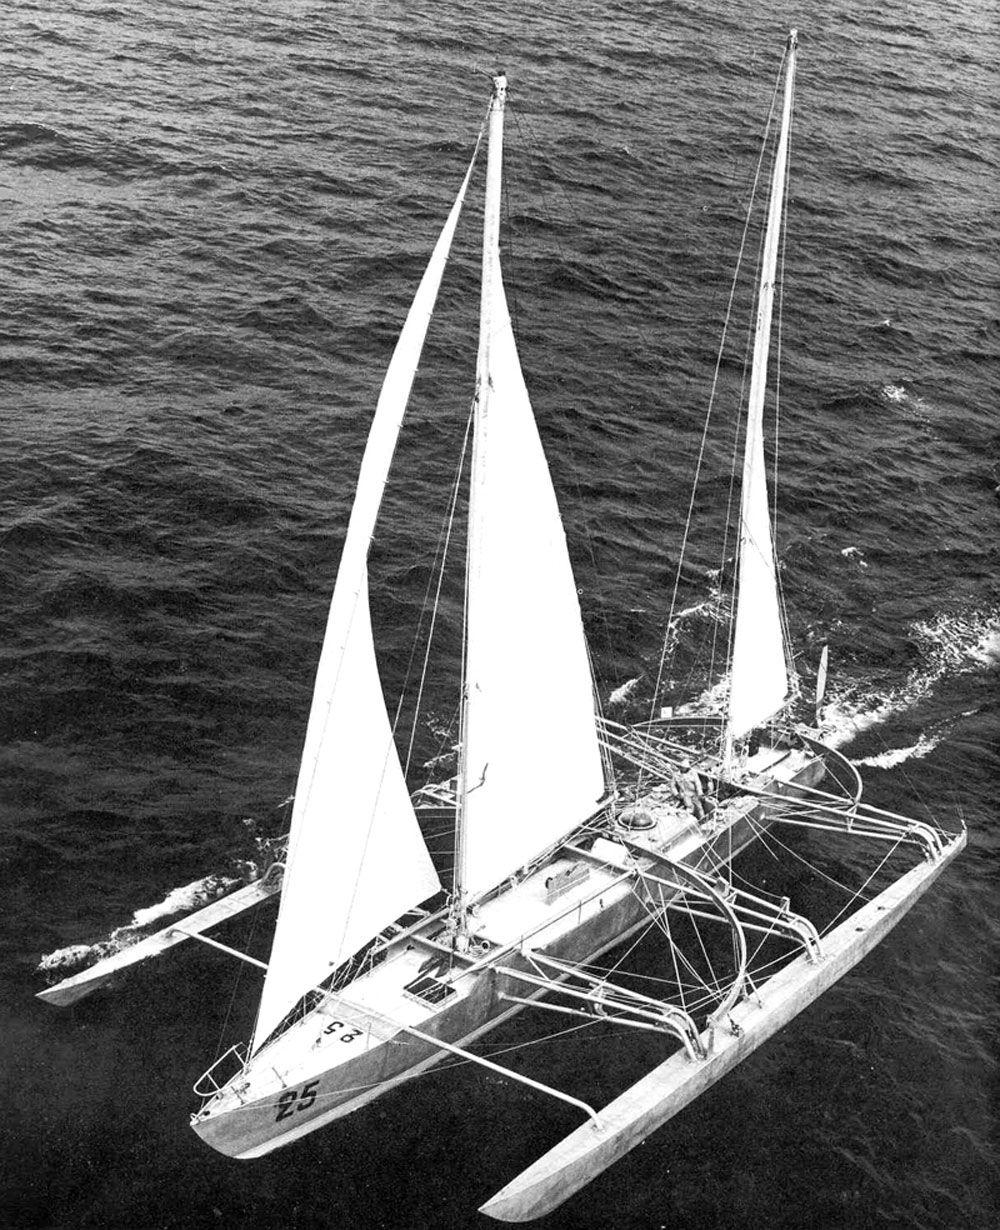 Motart Pen Duick Iv Sailing Pictures Sailing Yacht Luxury Sailing Yachts